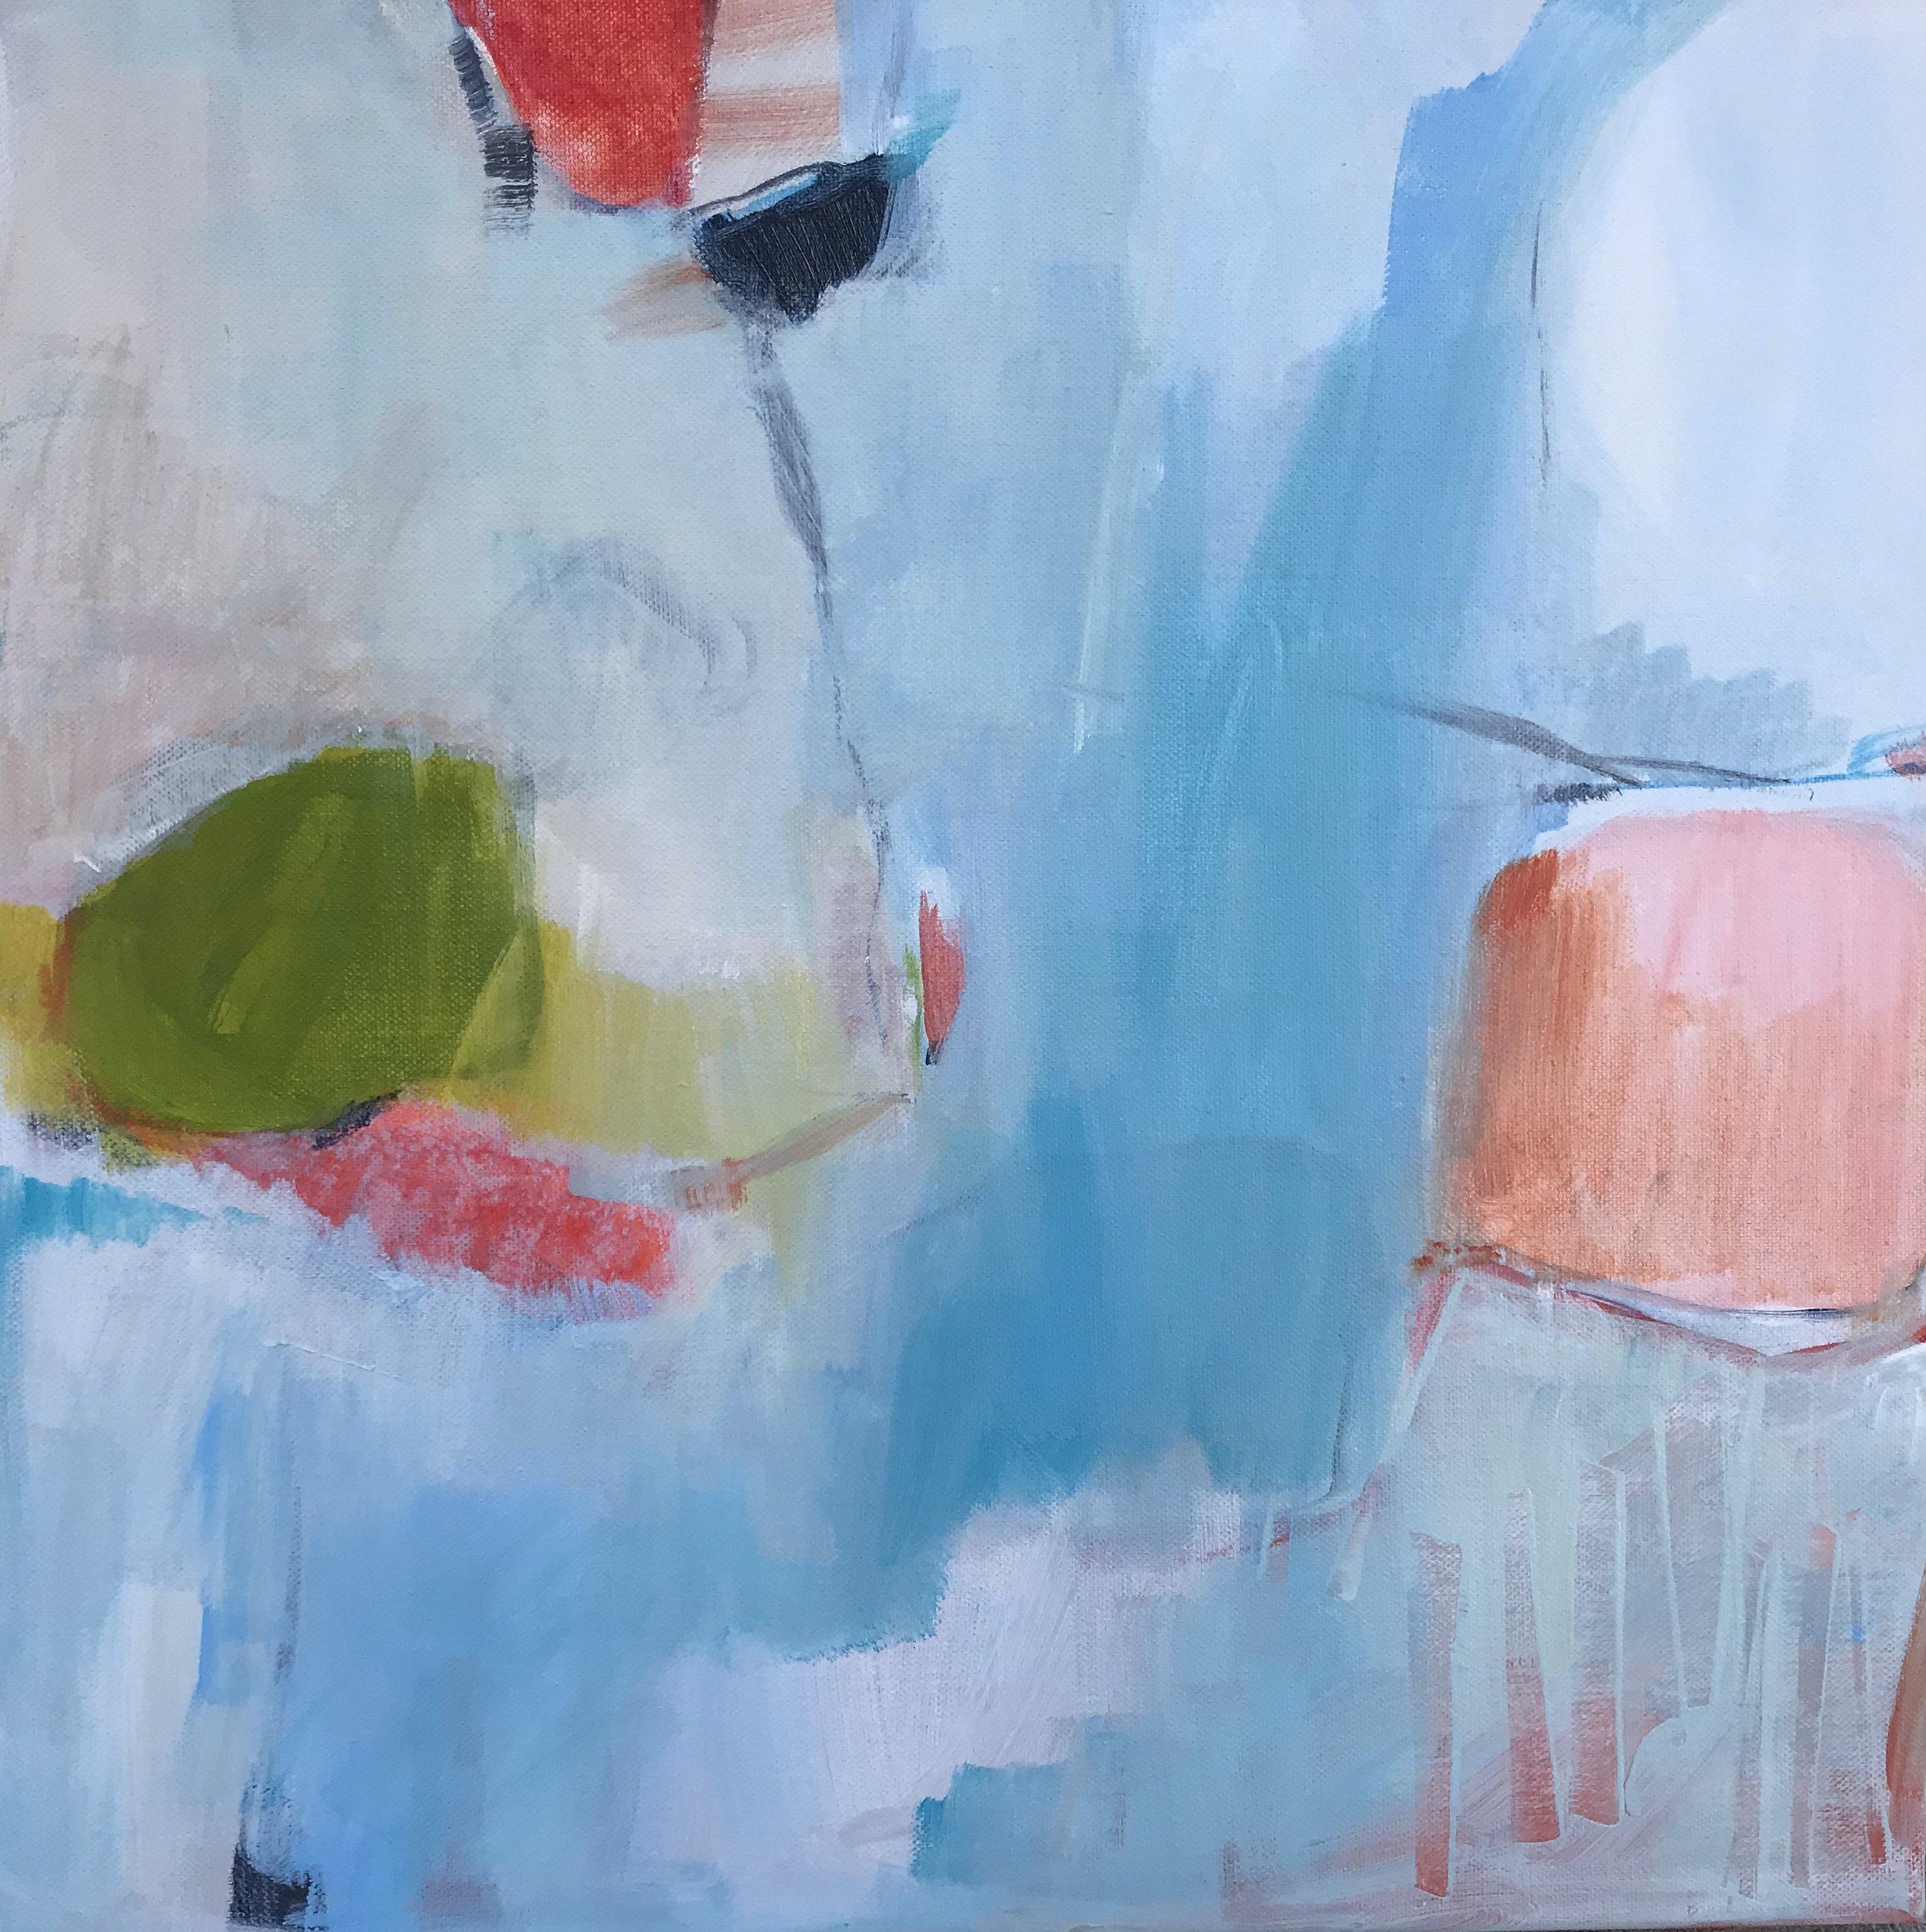 A River Runs Through It, Acrylic on Canvas, 16 x 16